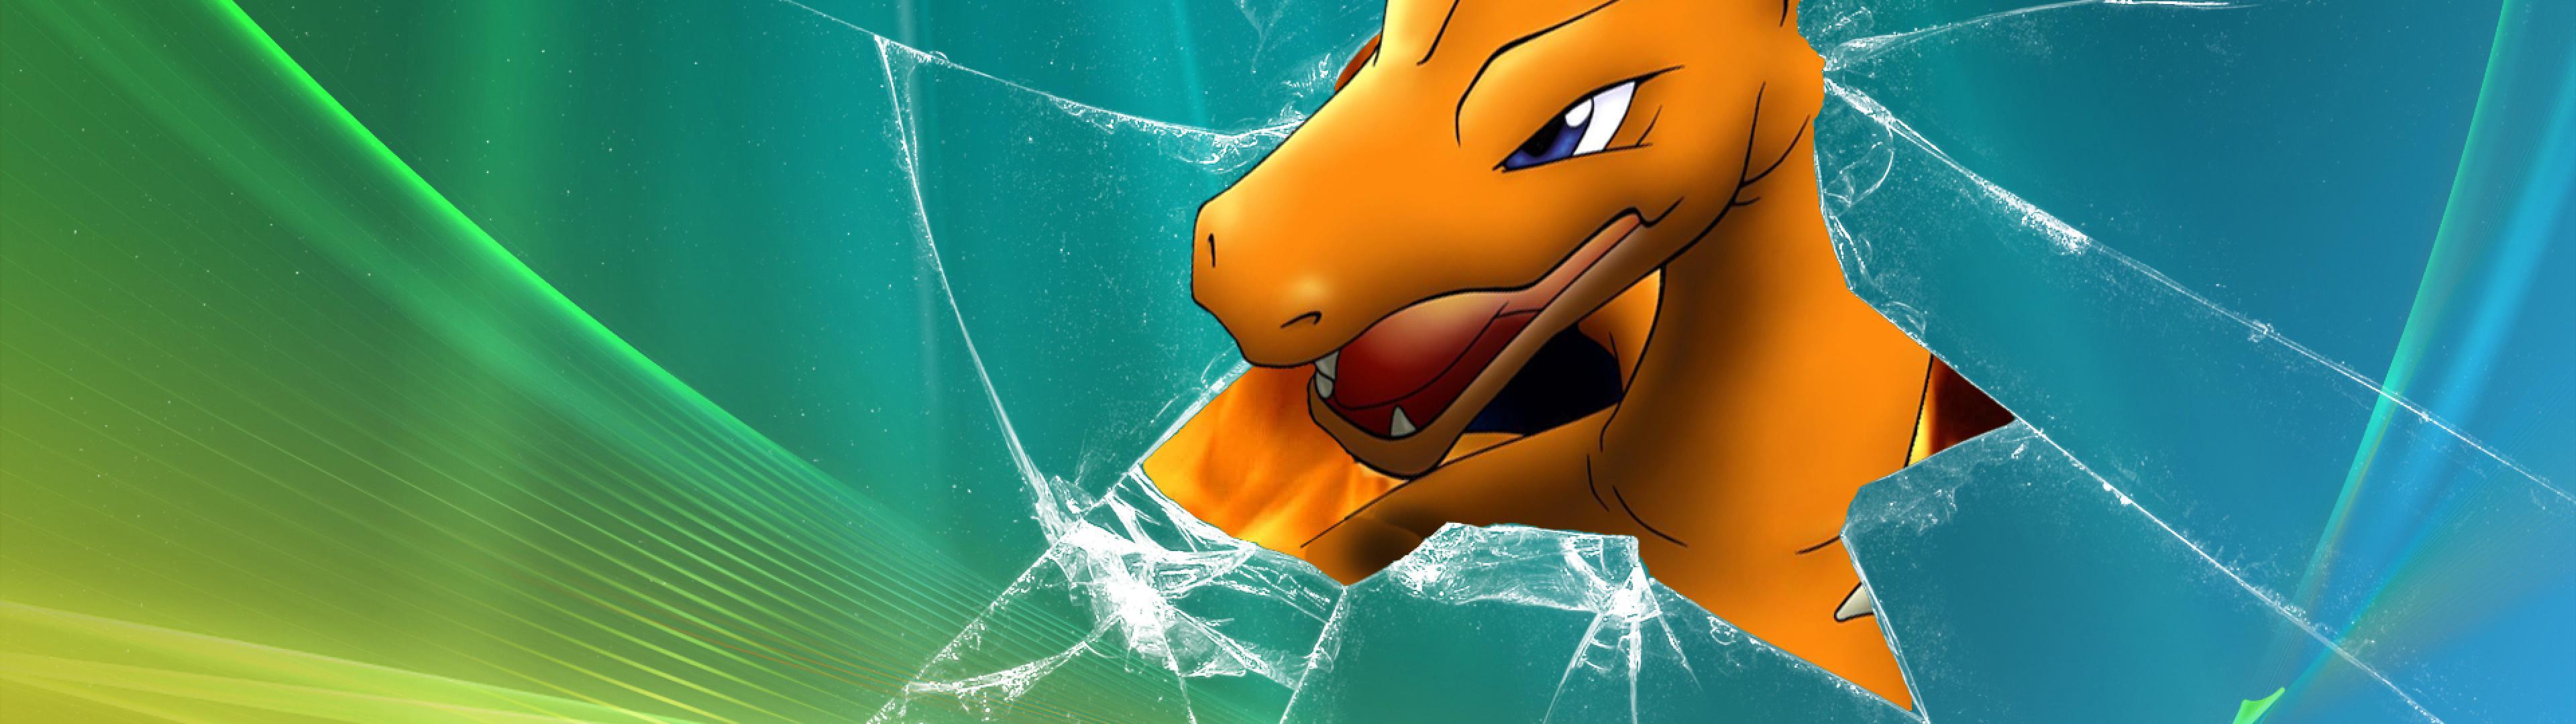 pokemon vista broken screen charizard Ultra or Dual High Definition 3840x1080